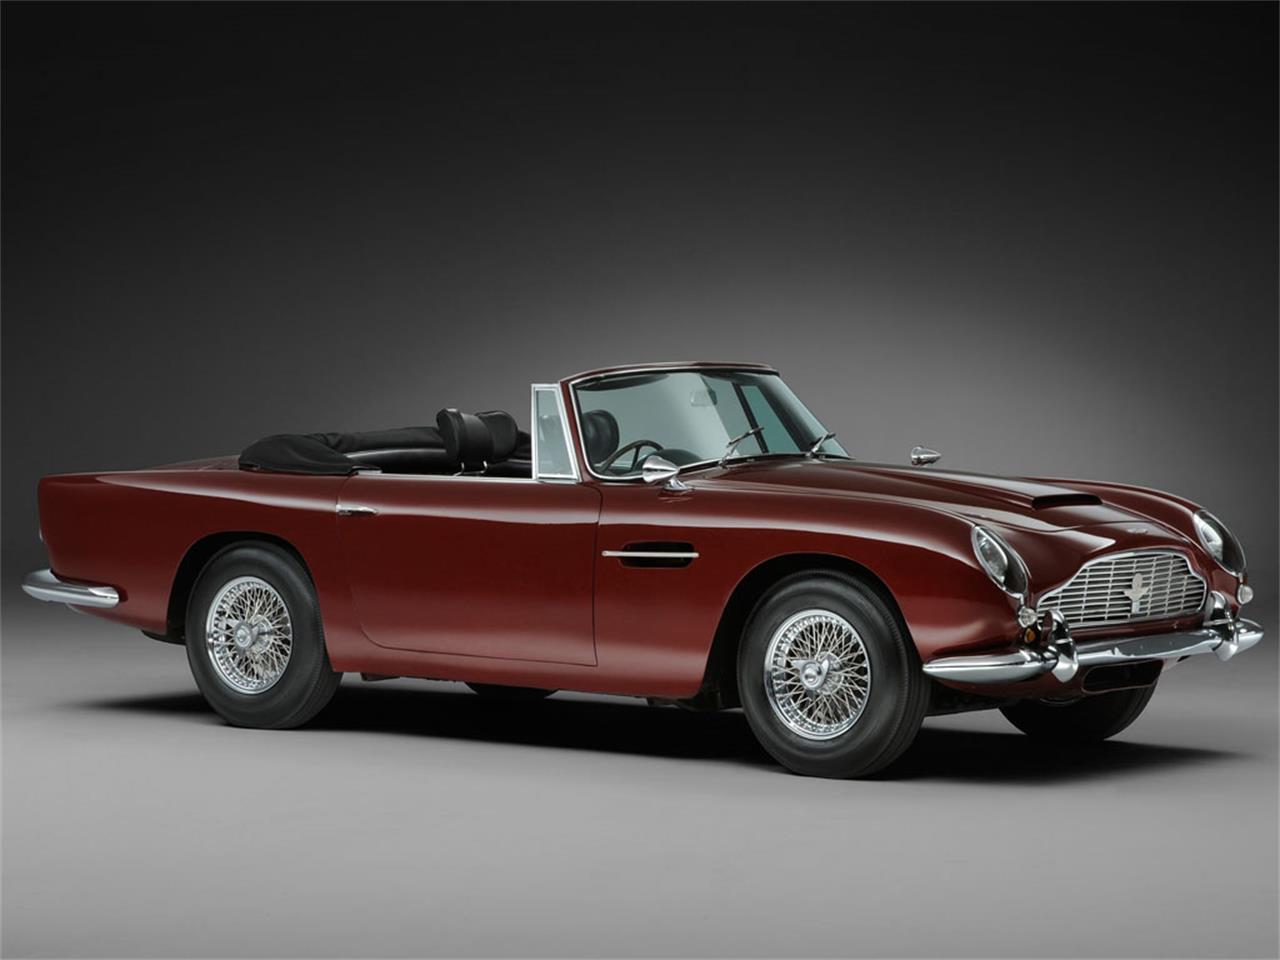 1965 Aston Martin Db5 Convertible For Sale Classiccars Com Cc 880426